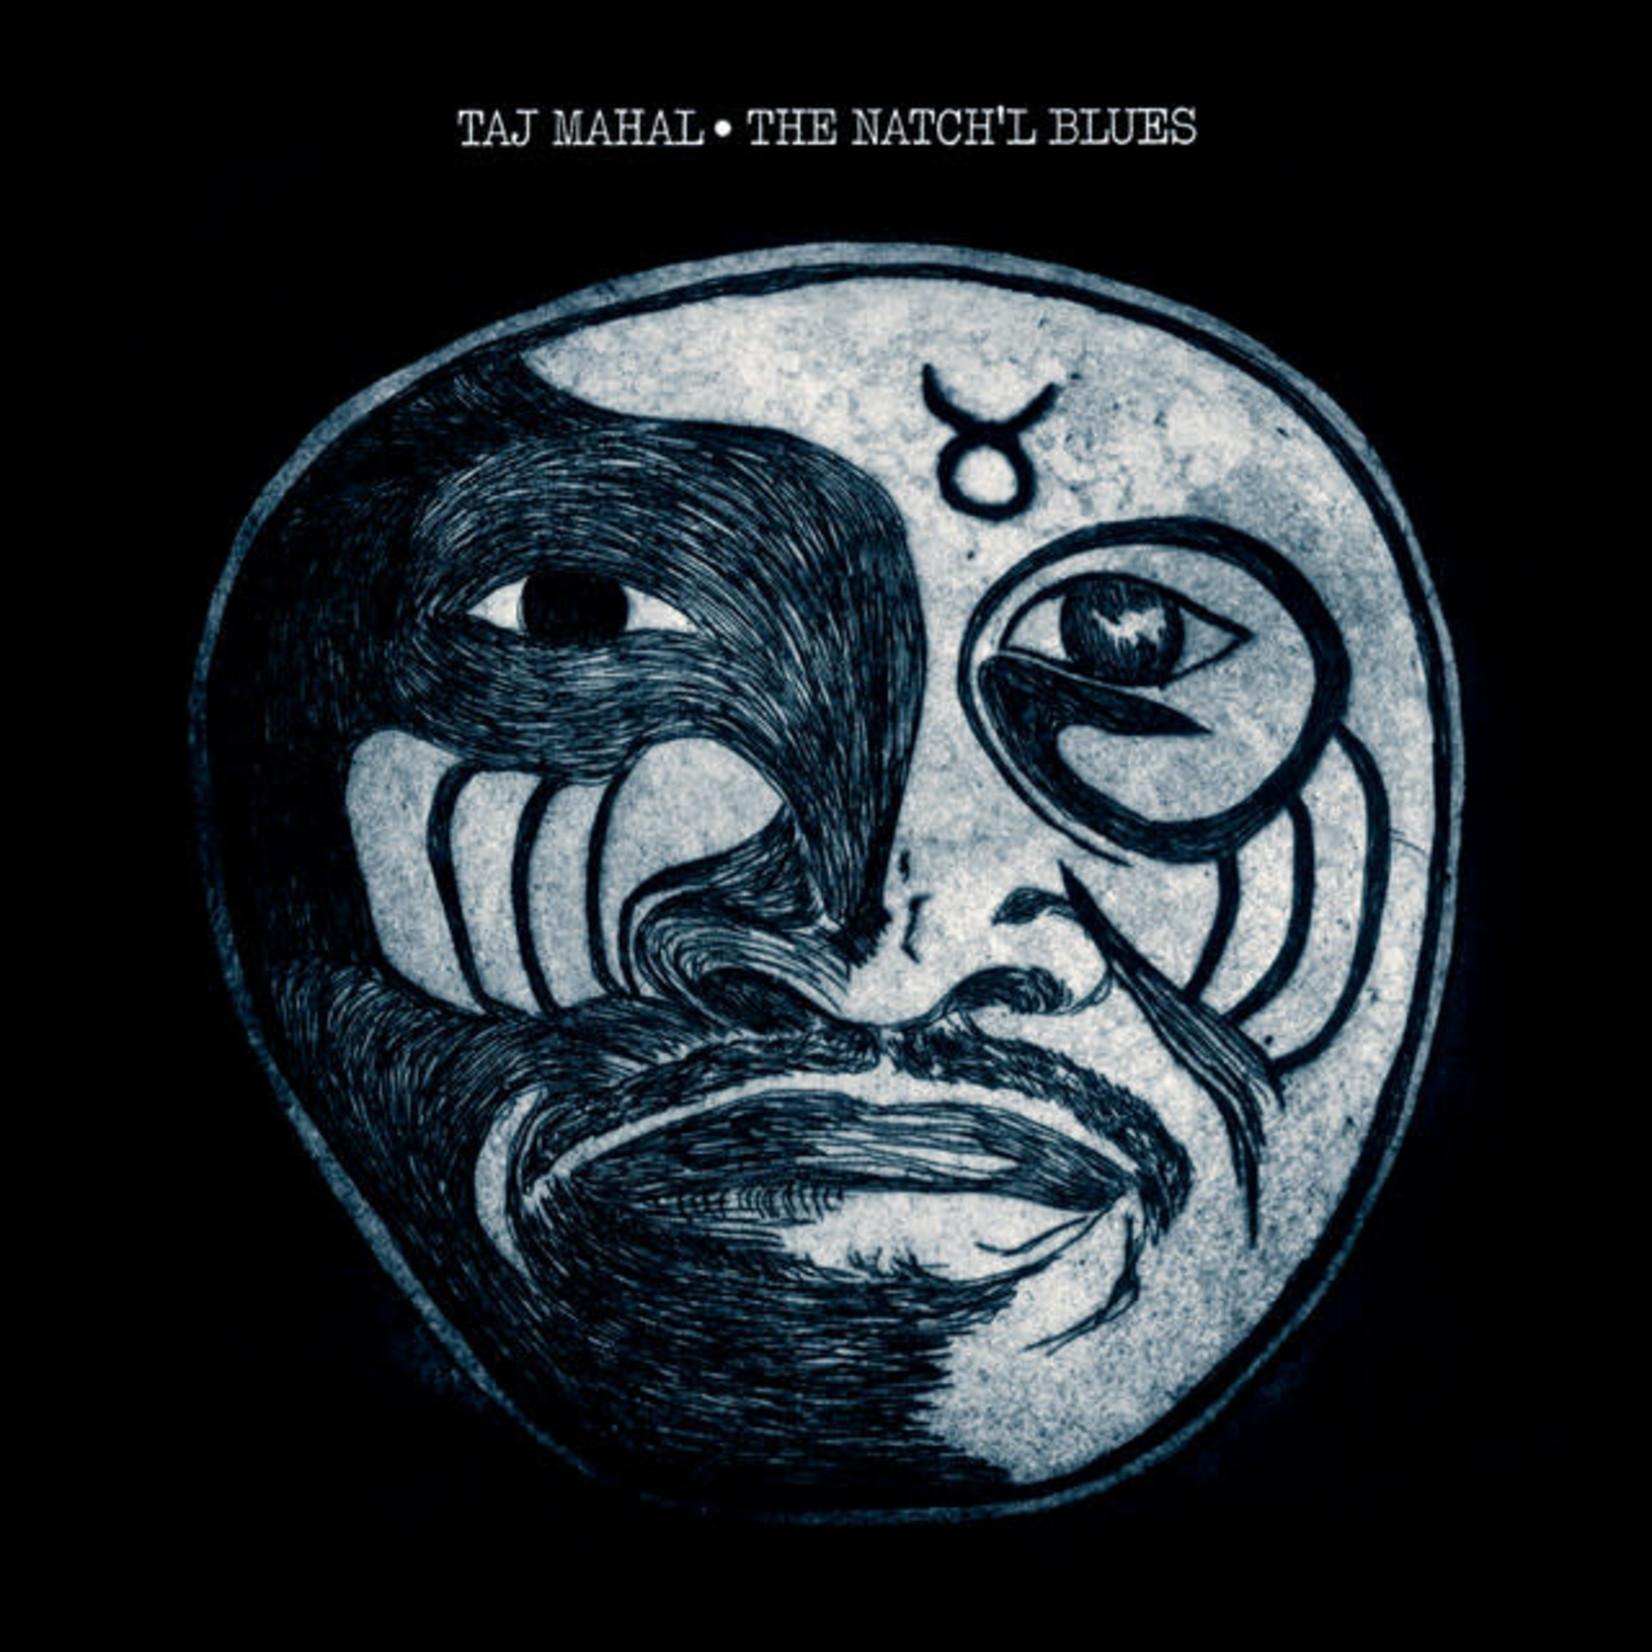 Vinyl Taj Mahal - The Natch'l Blues